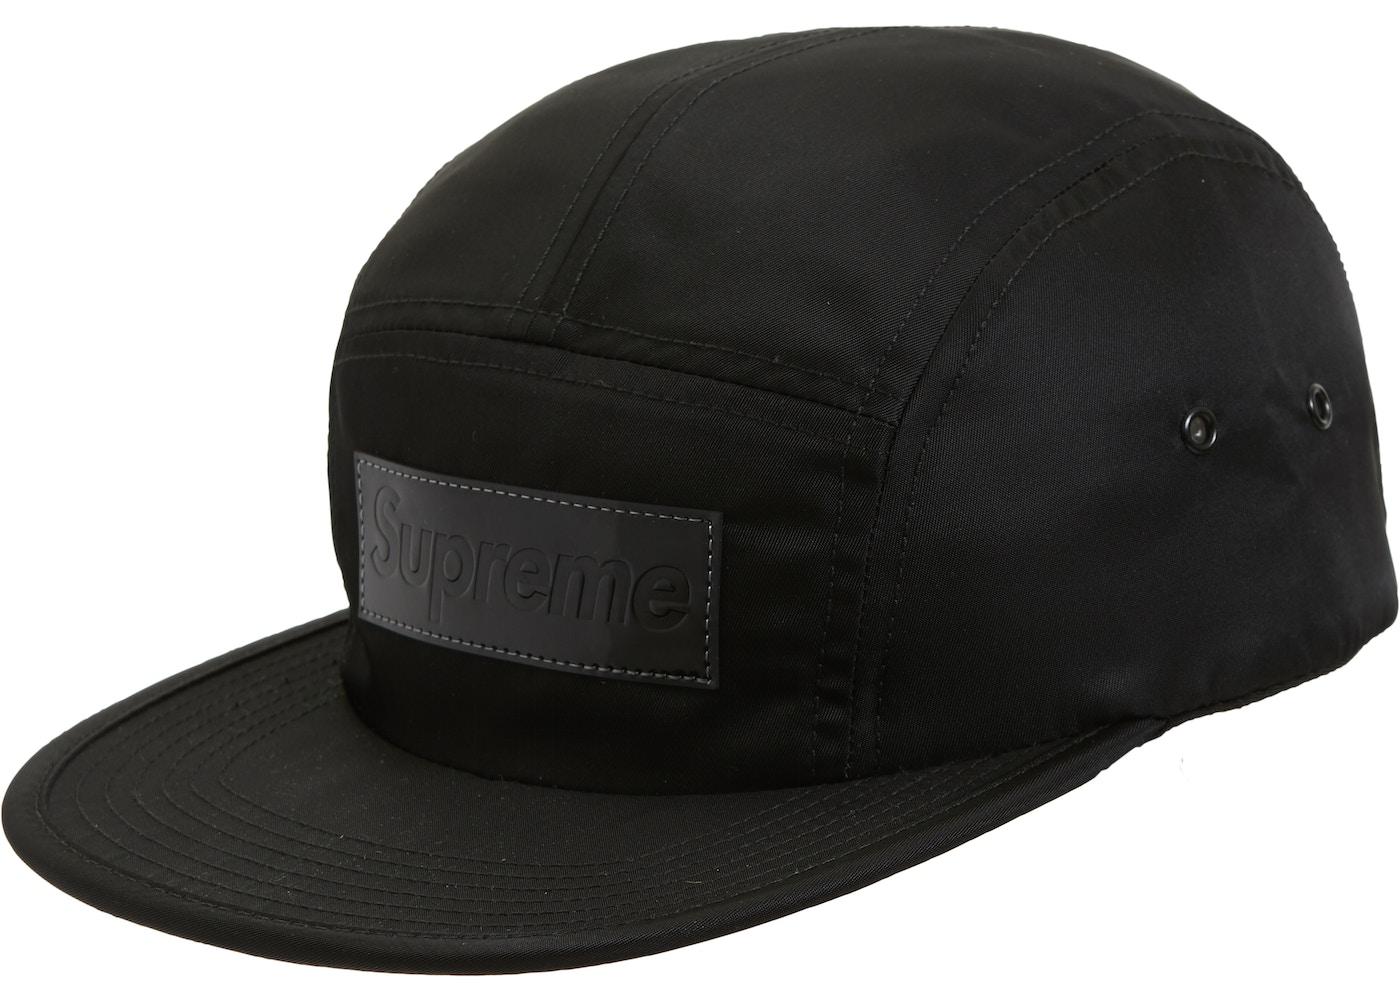 Supreme Patent Leather Patch Camp Cap Black - FW18 fc8d08b25bb